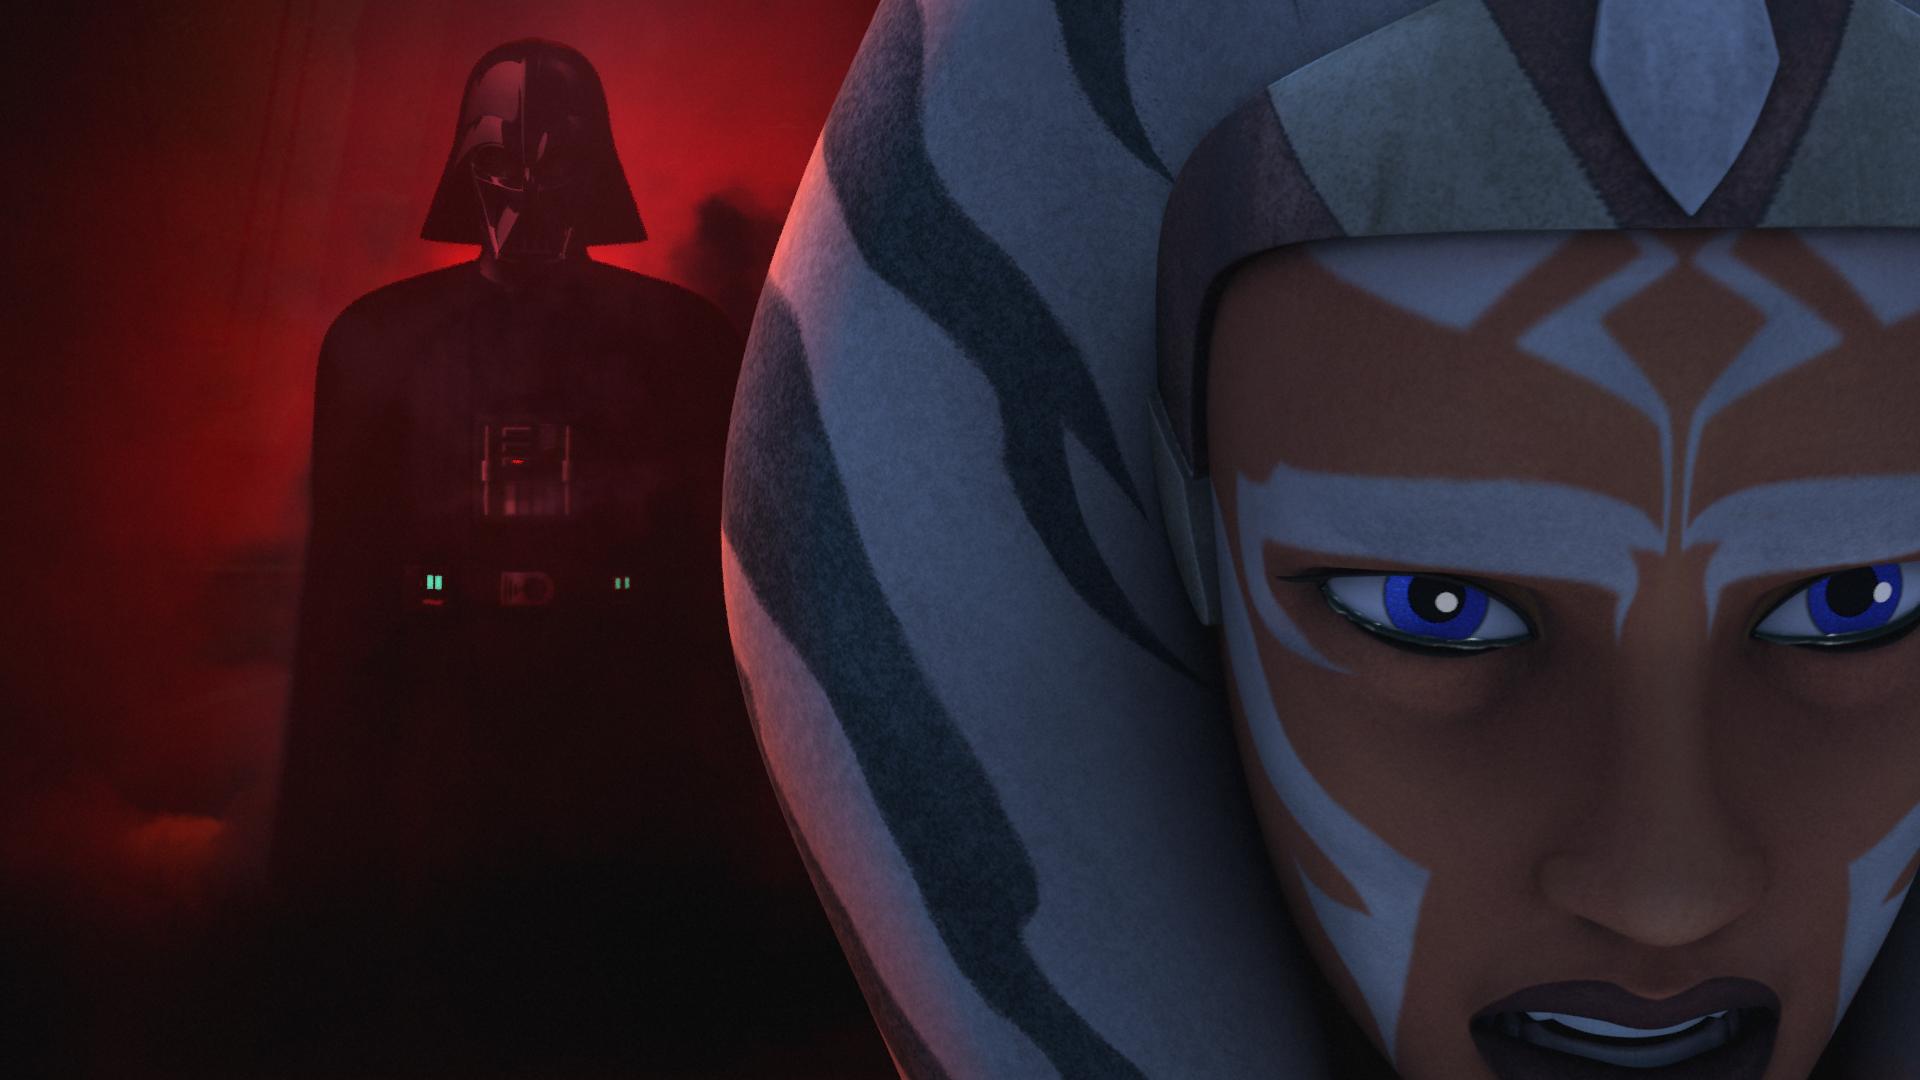 Ahsoka and Vader